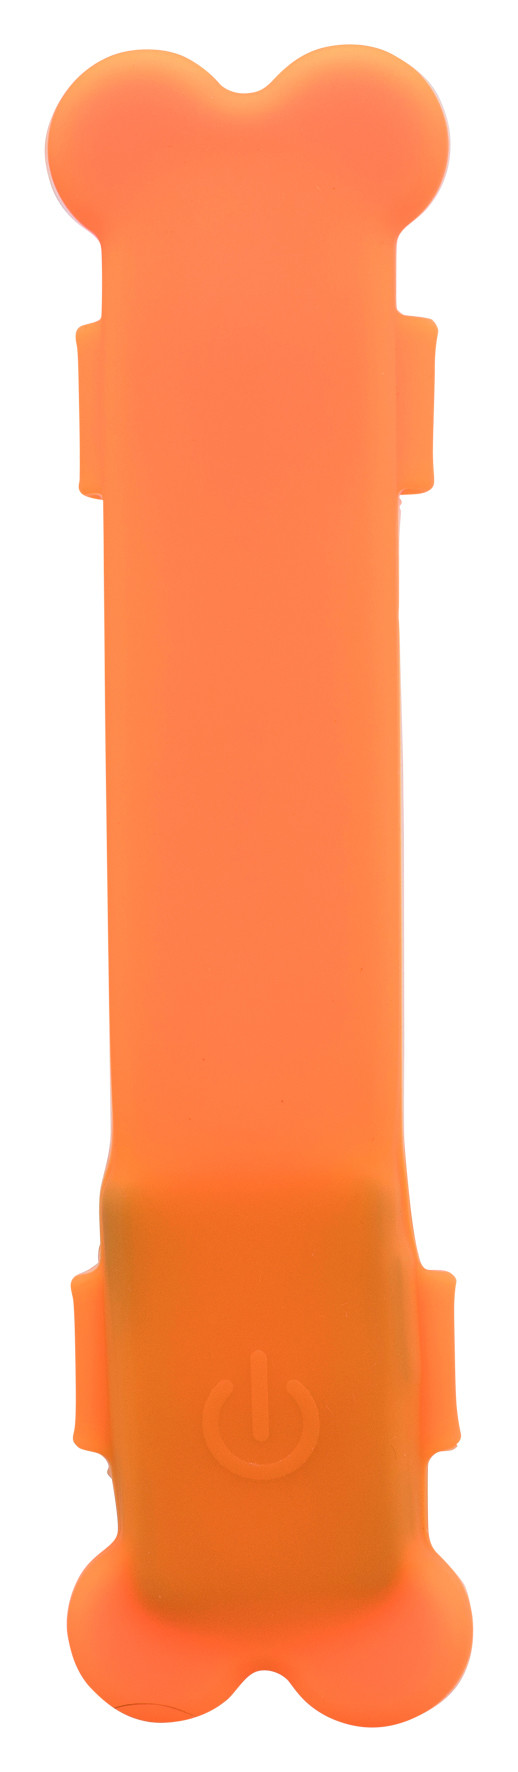 TRIXIE USB Flash lichtgevend bot oranje